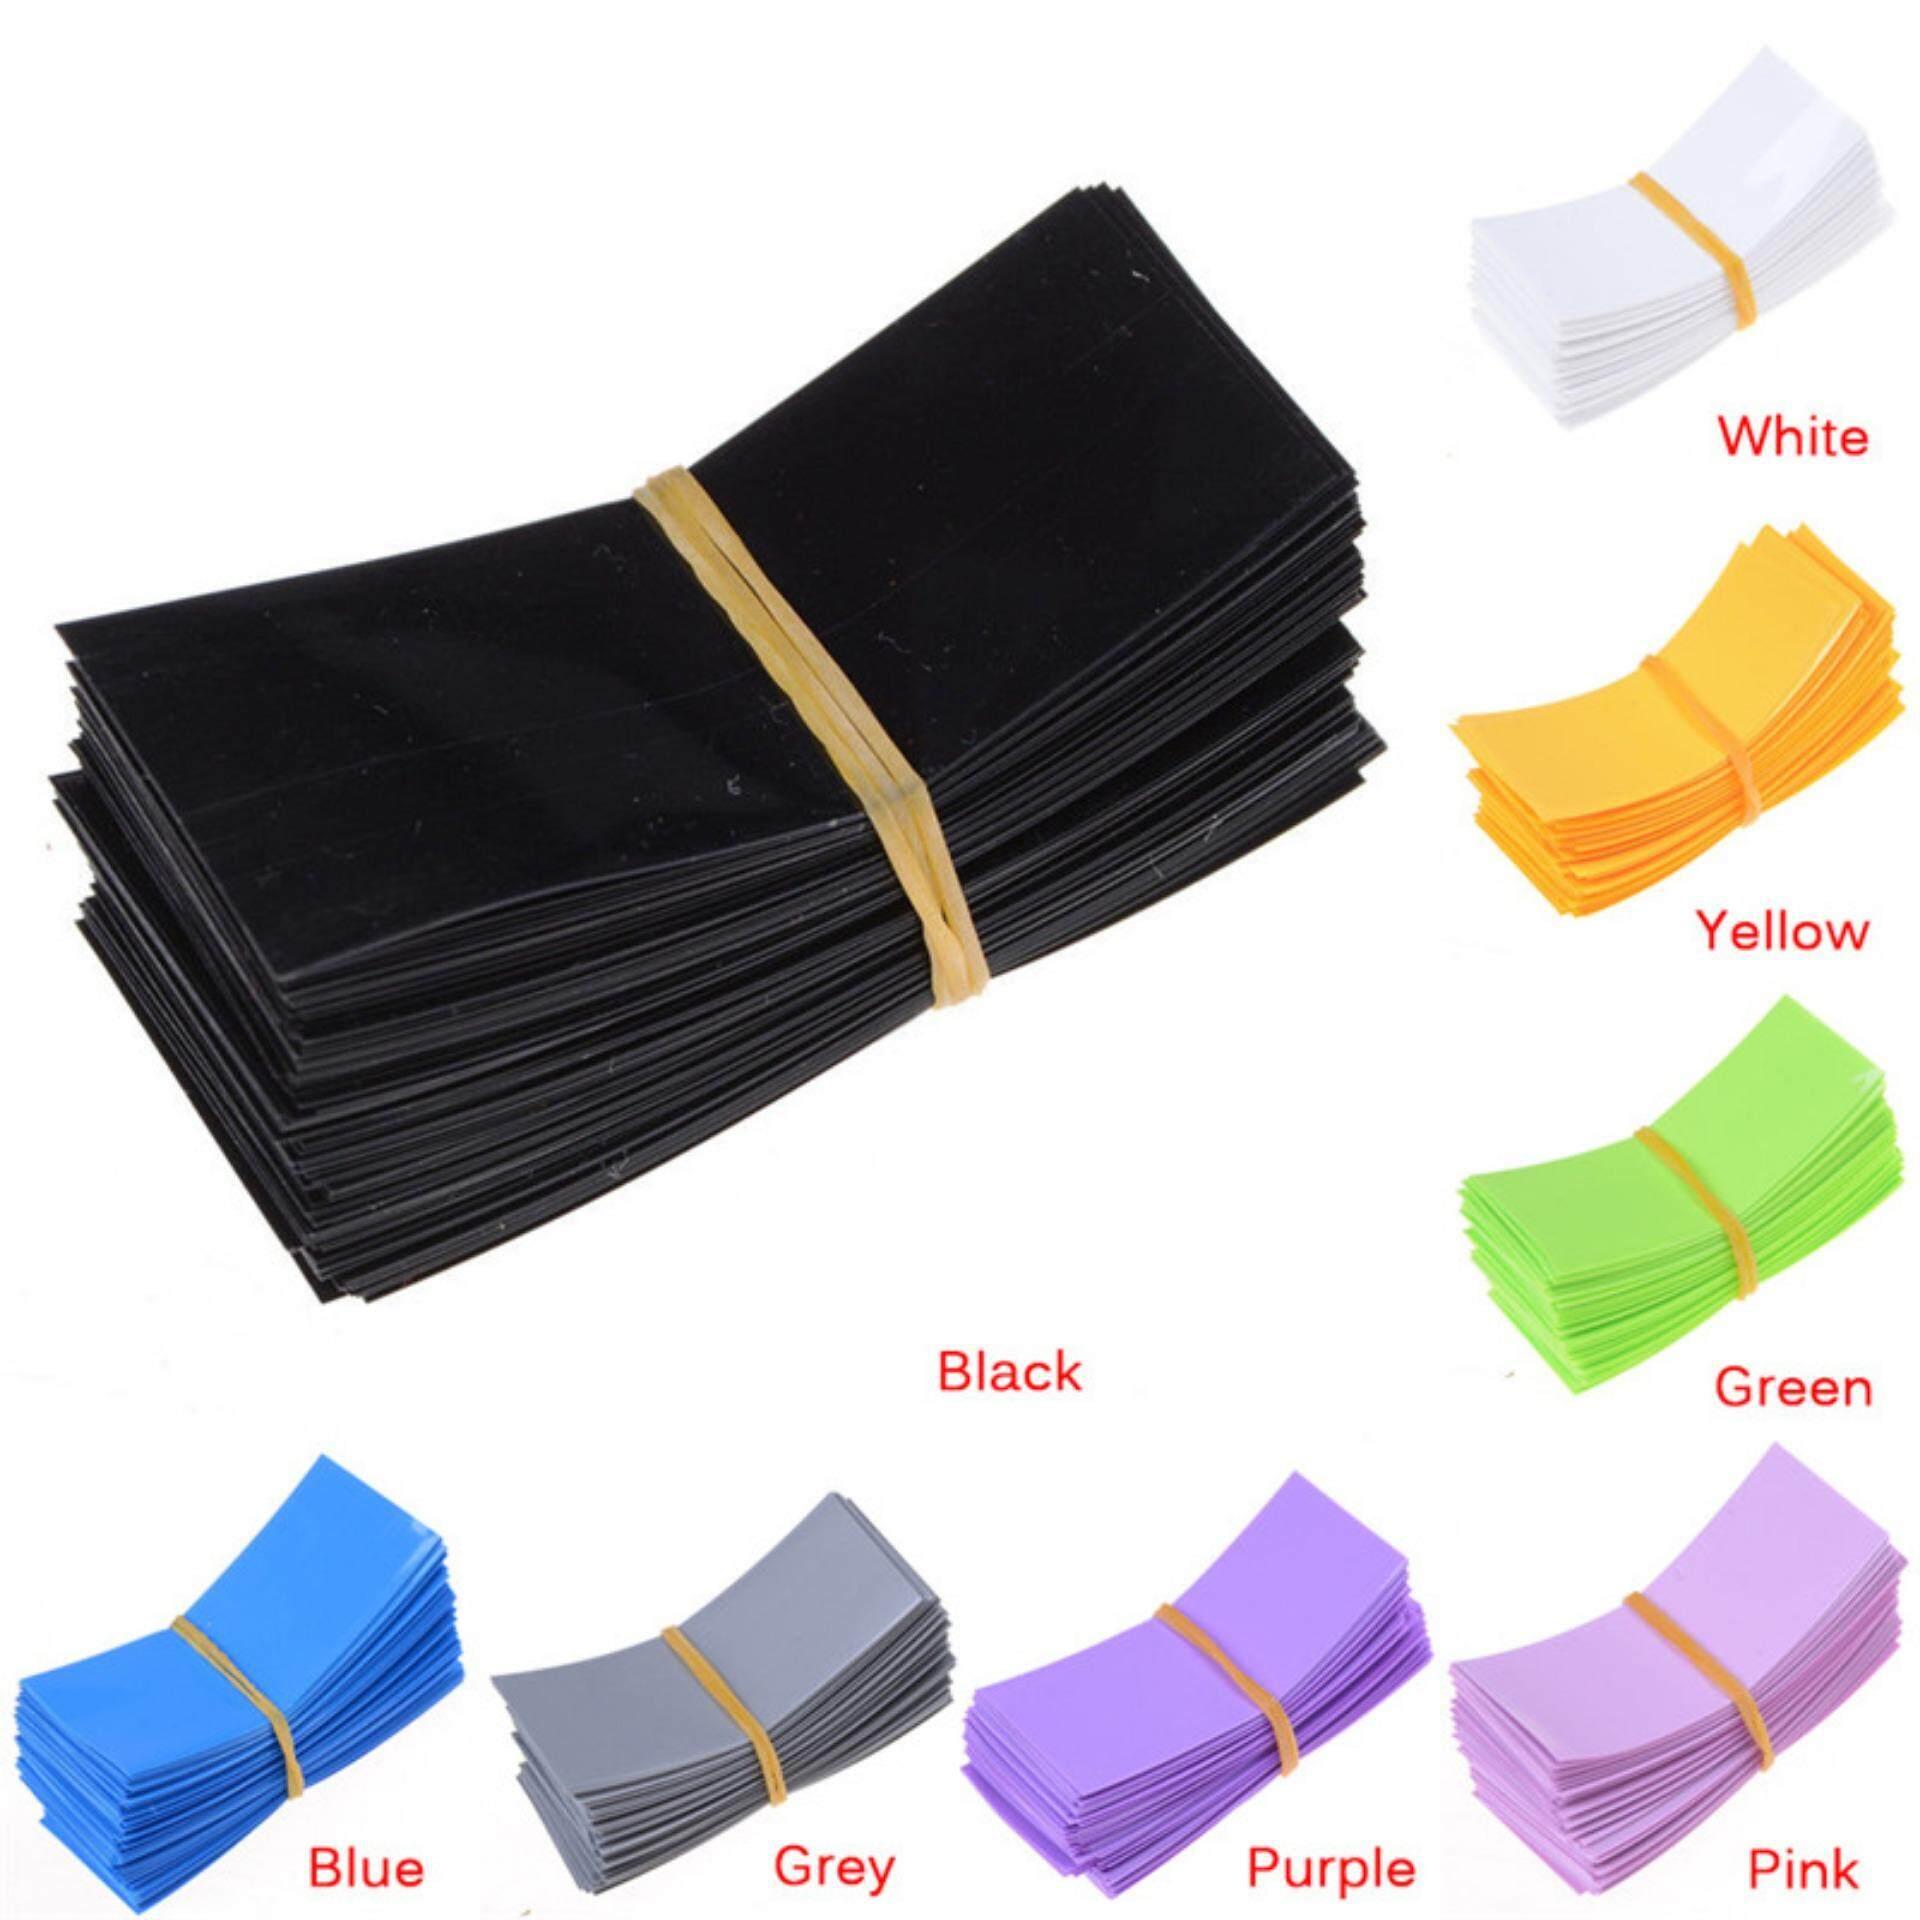 Sky Wing 100Pcs 18650 Battery Wrap PVC Heat Shrink Tubing Precut Battery Film Tape Cover Convenient Multicolor